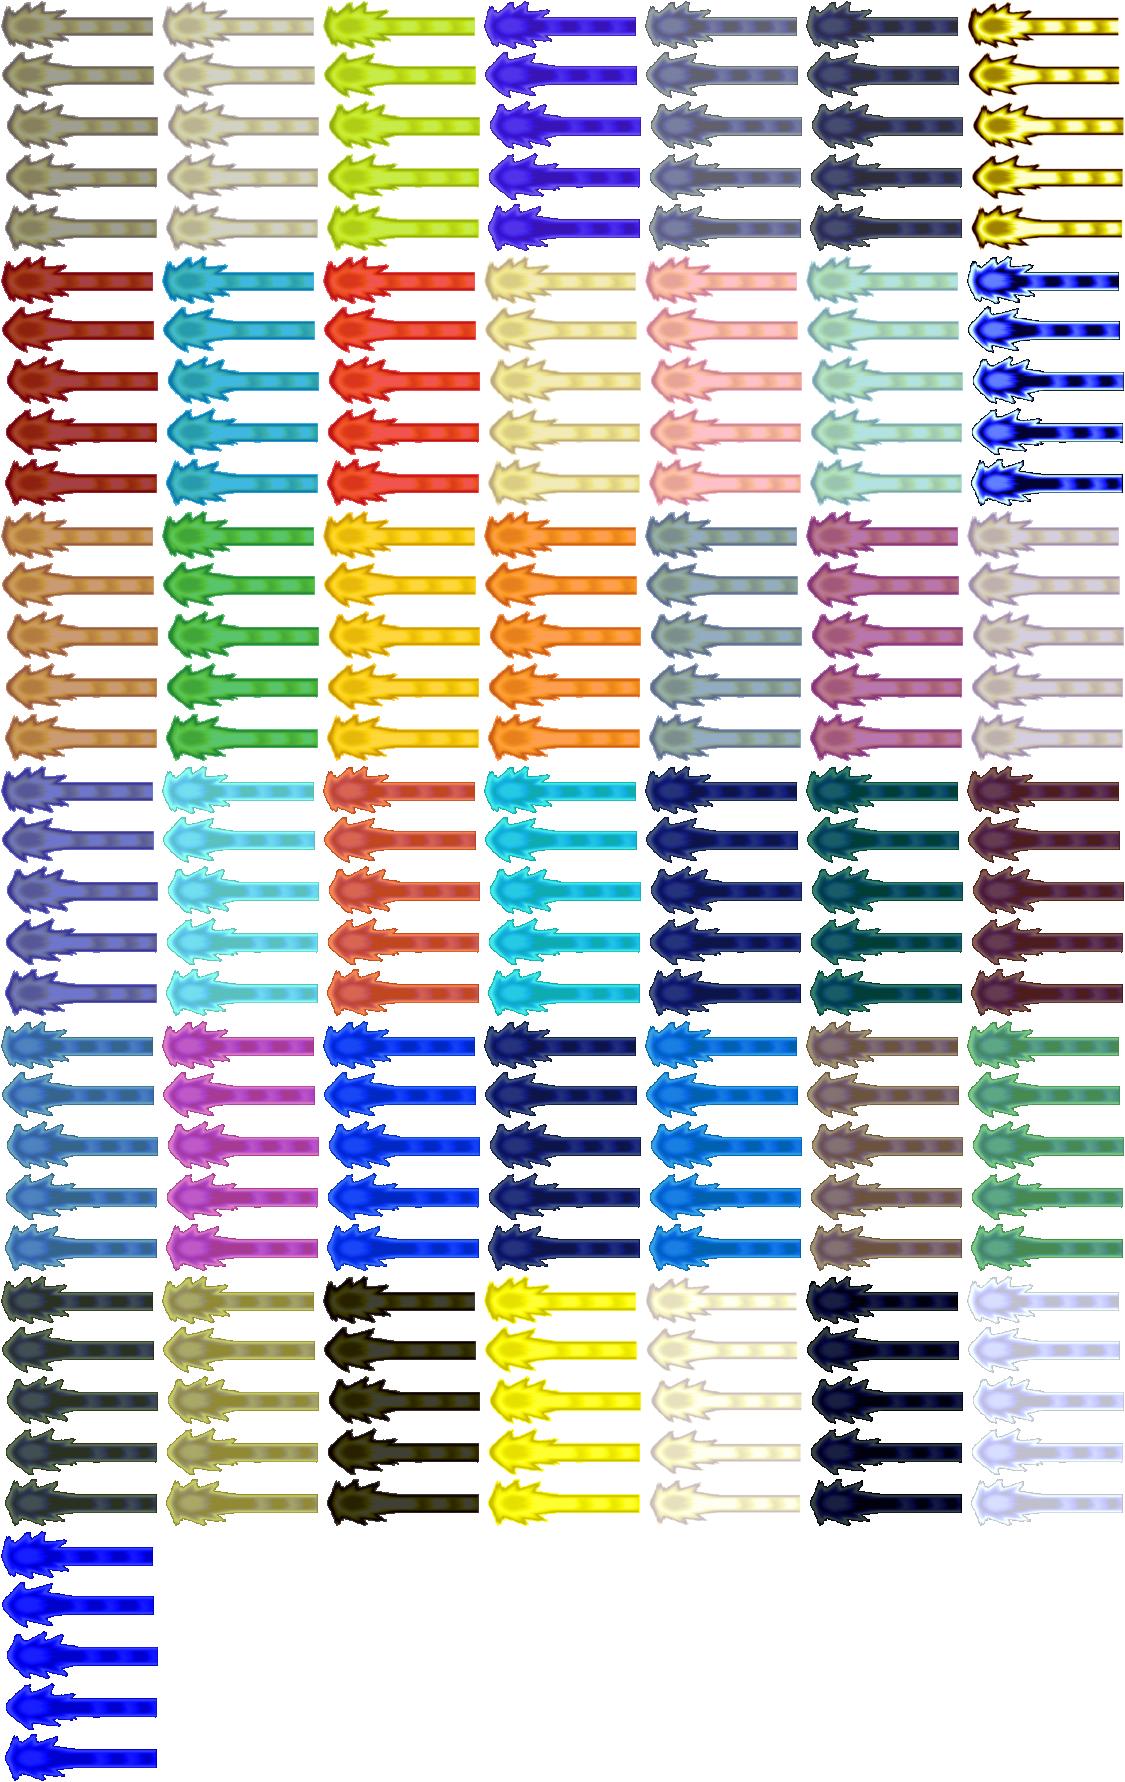 Kamehameha Wave Sprites By MyPicts On DeviantArt - 1125x1782 - png Ultra Ball Sprite